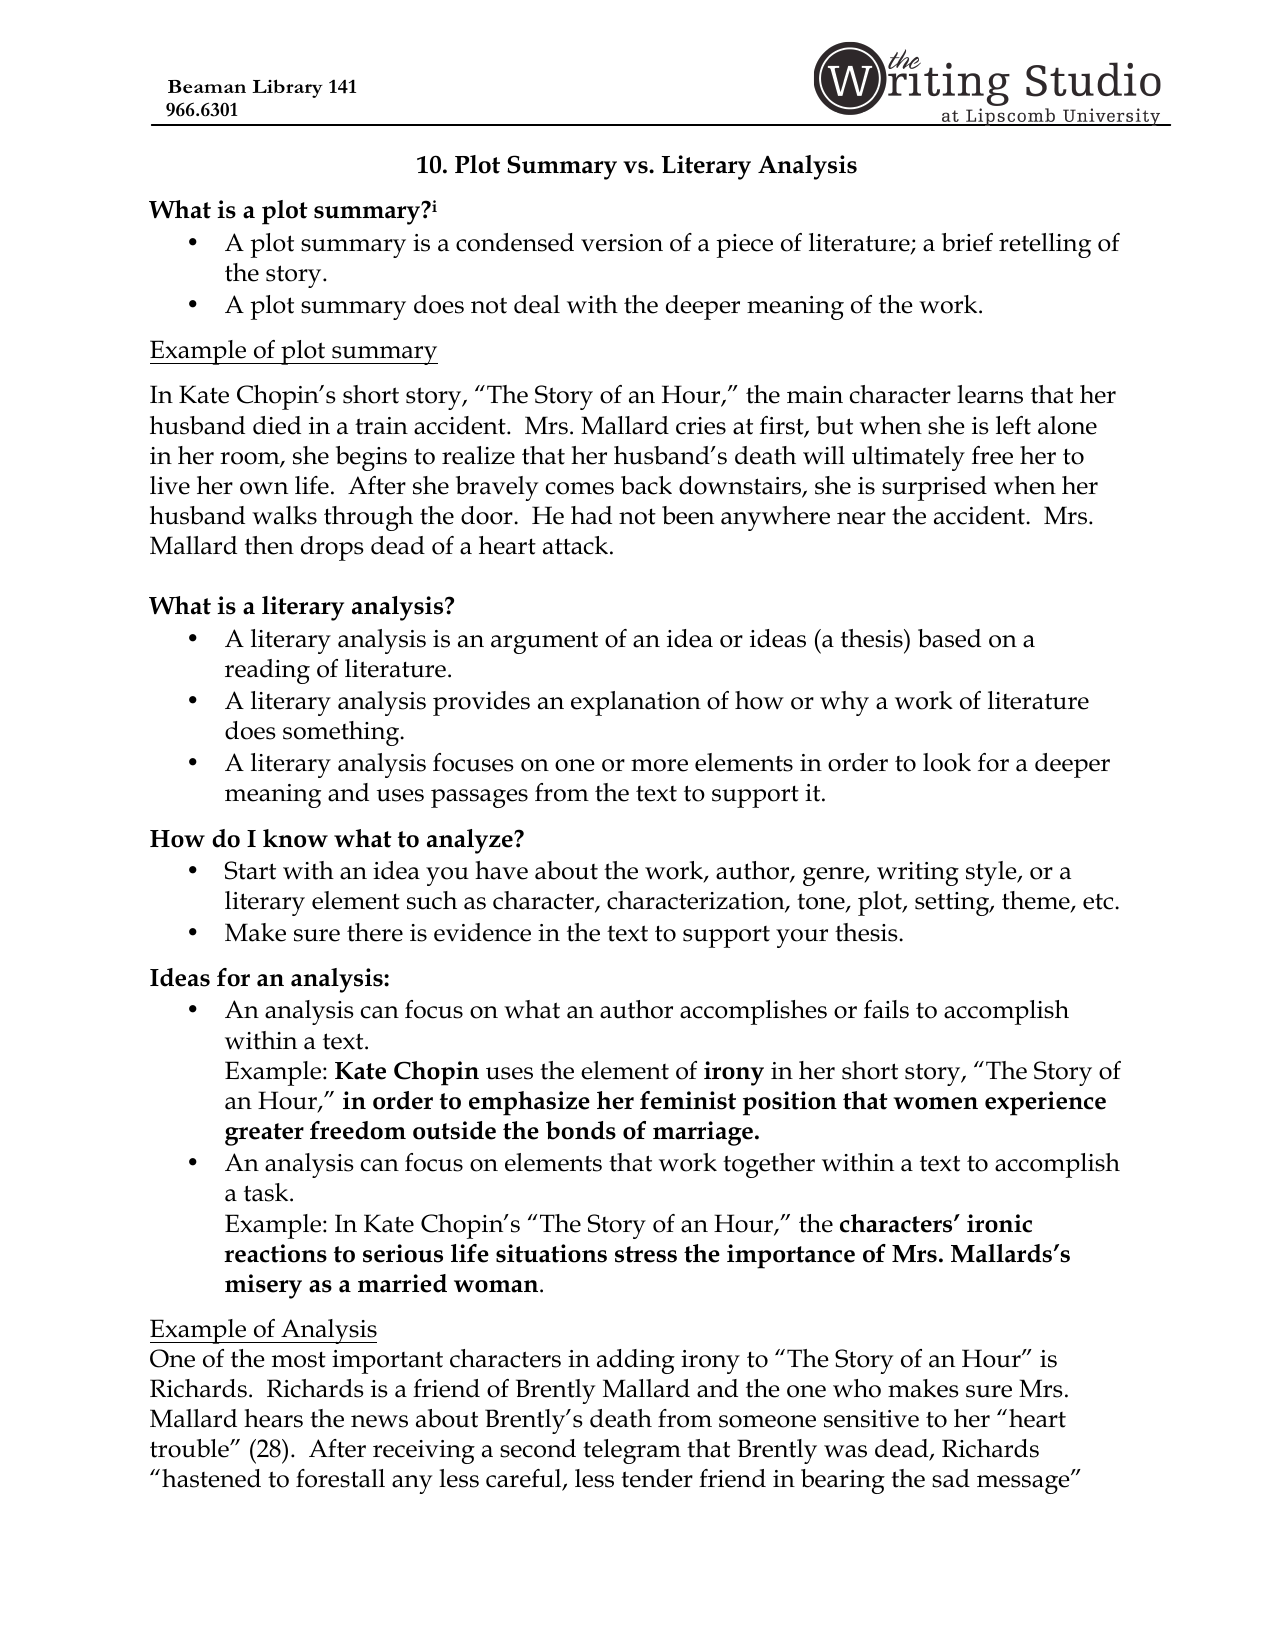 Persuasive essay on uniforms in schools